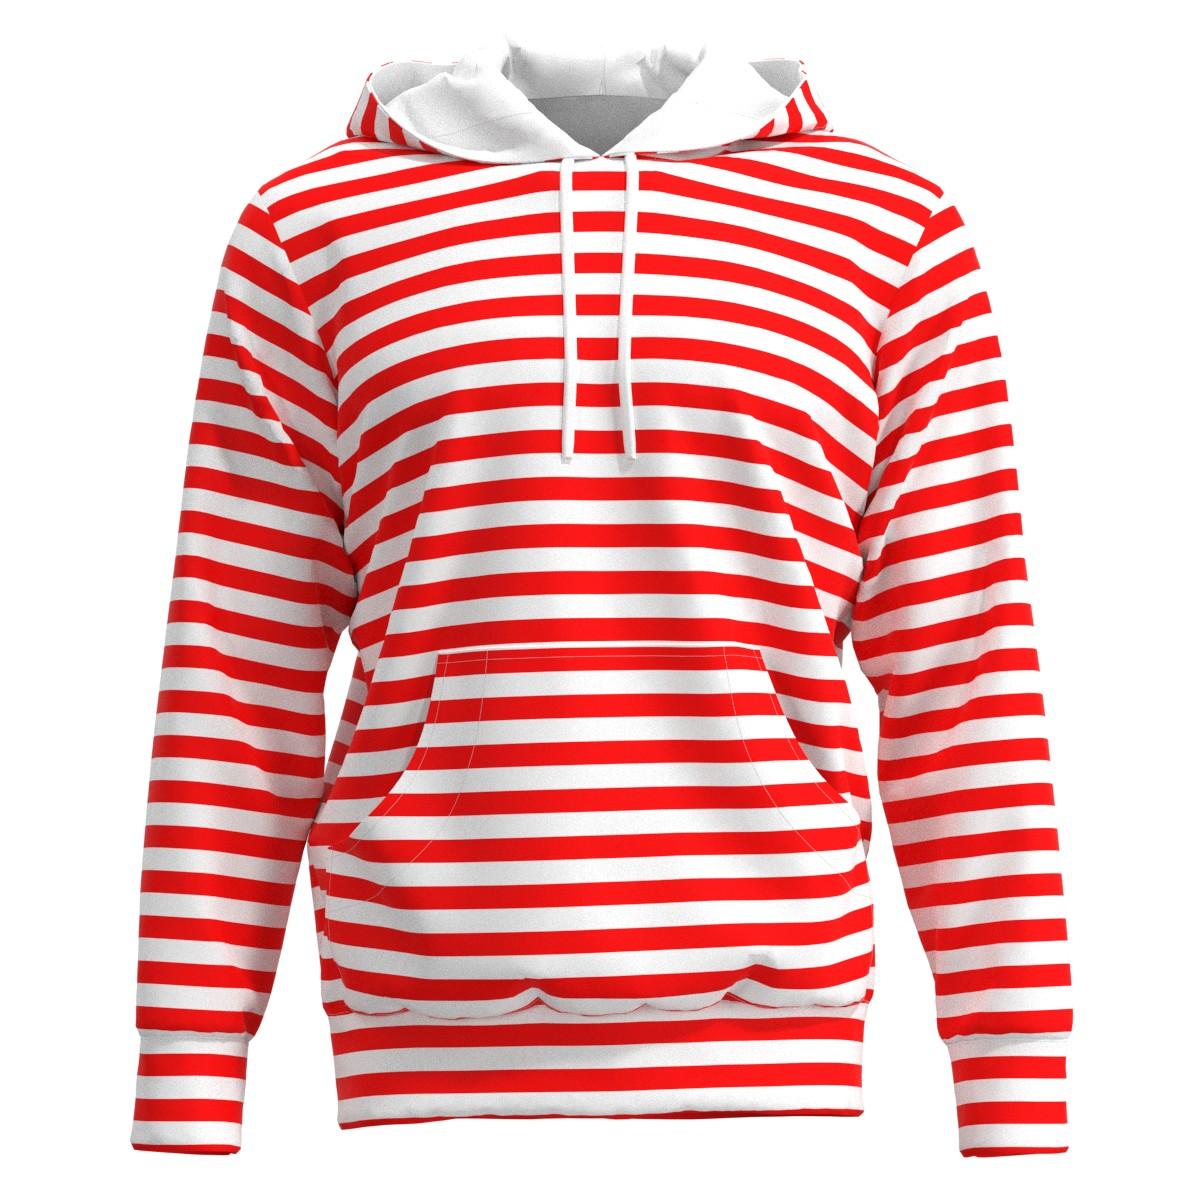 Red   White Horizontal Stripes Men Women Hoodie Sweatshirt Sweater Size  XS-3XL 0ed7b6685